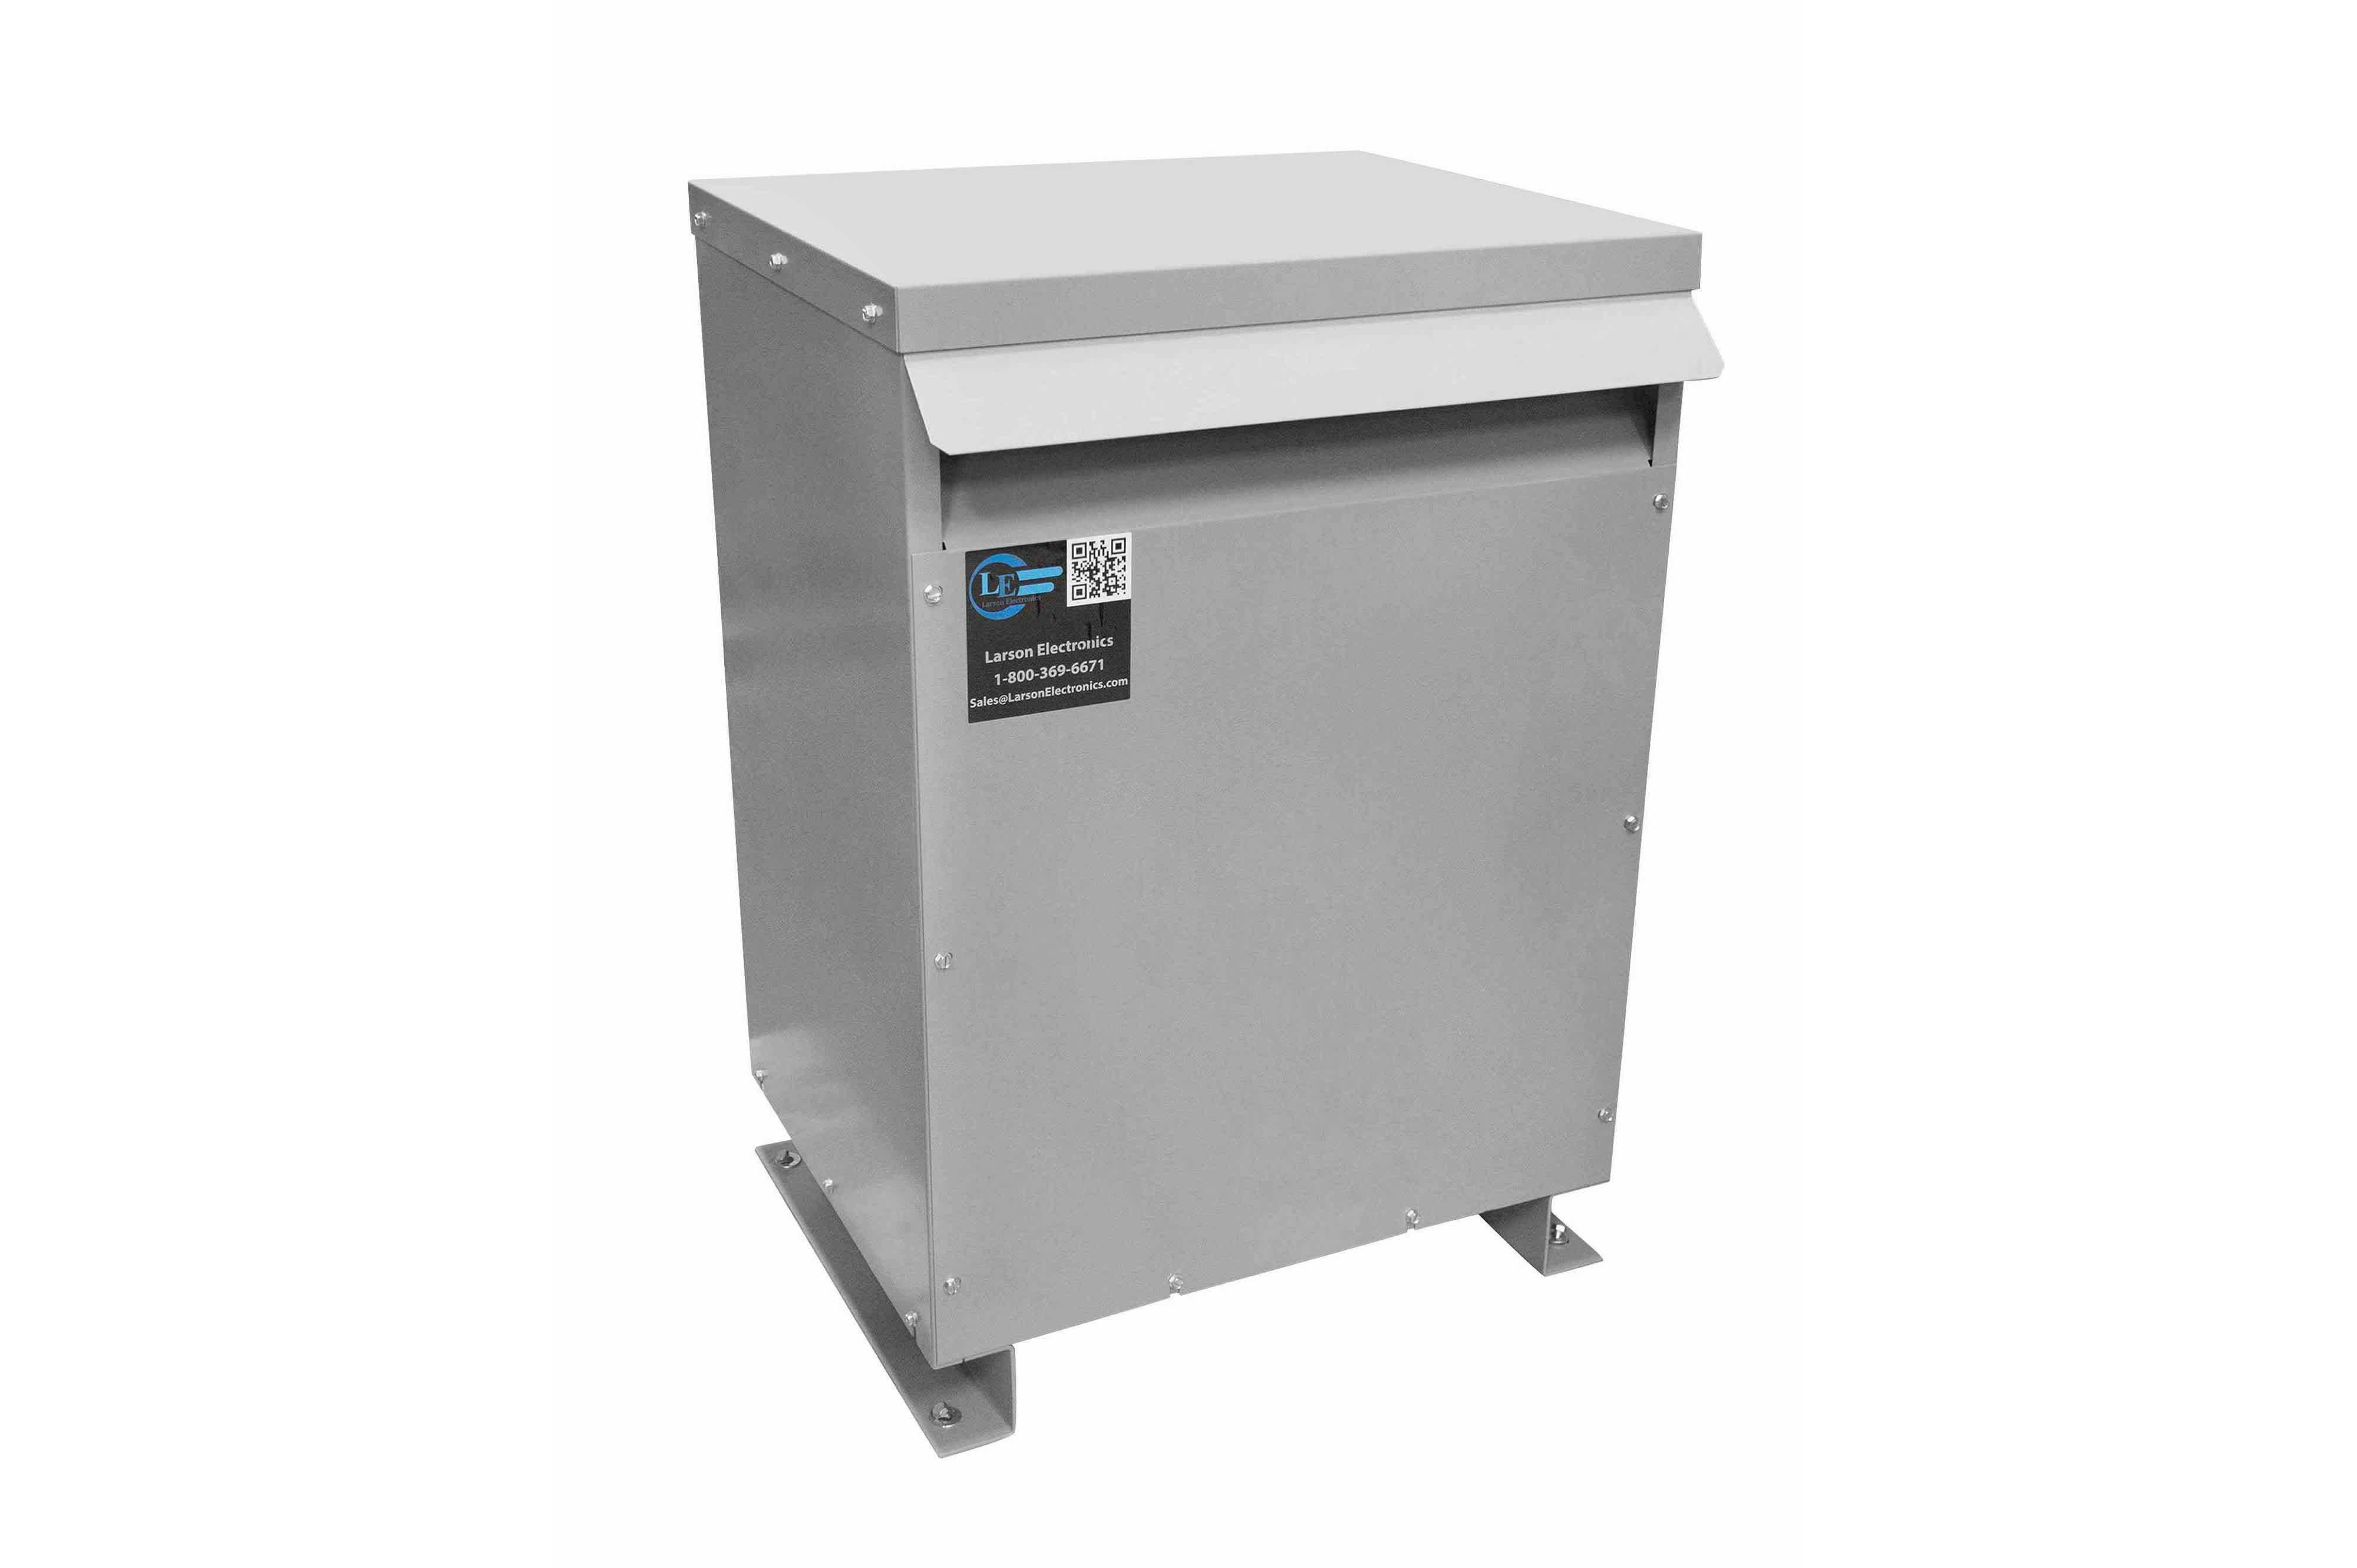 29 kVA 3PH Isolation Transformer, 460V Wye Primary, 575V Delta Secondary, N3R, Ventilated, 60 Hz